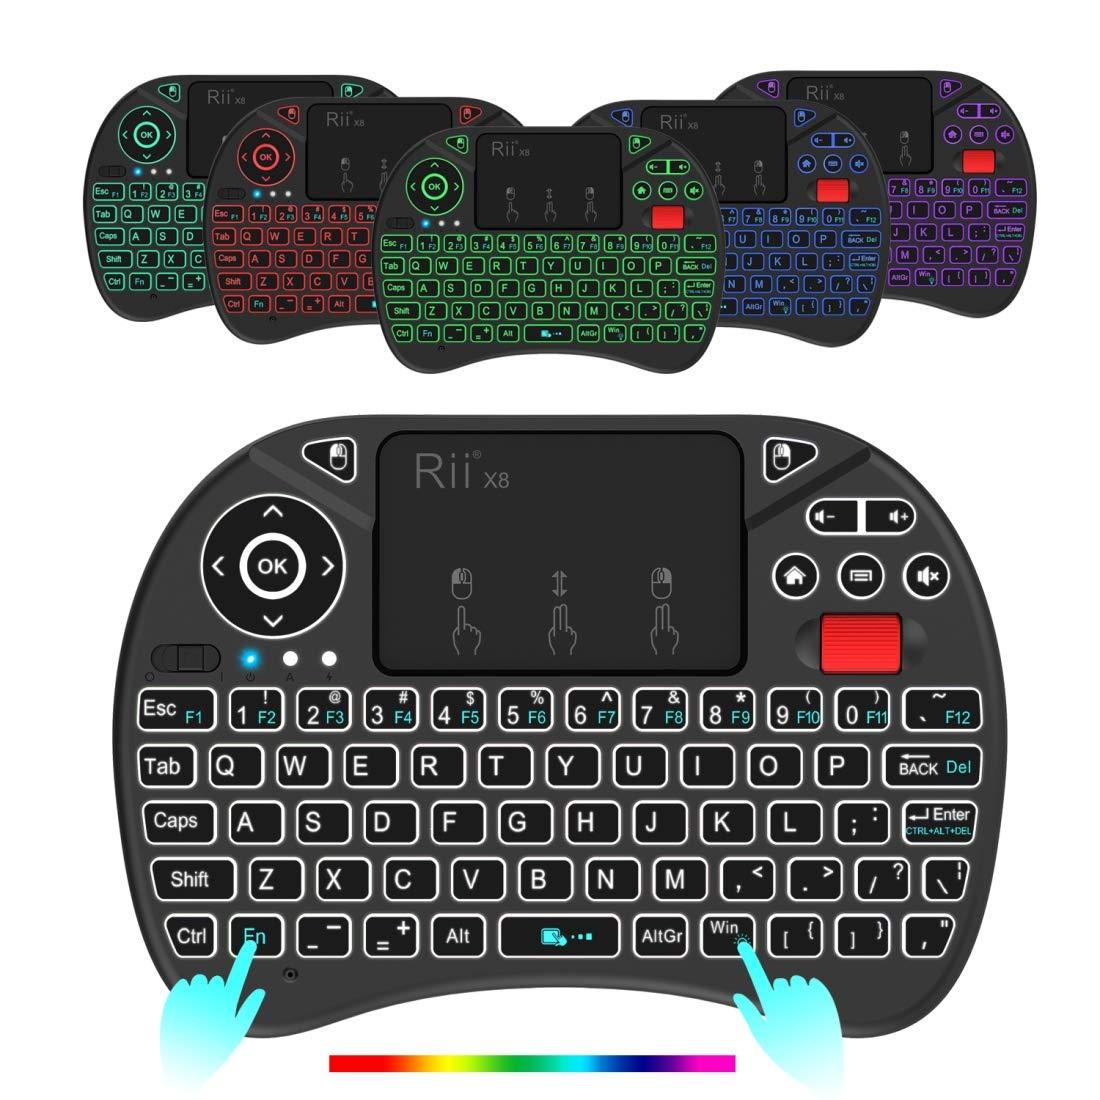 7f830acf705 Amazon.com: QGT Rii X8 RT716 2.4GHz Mini Wireless QWERTY 71 Keys Keyboard, 2.5  inch Touchpad Combo with Backlight(Black): Electronics